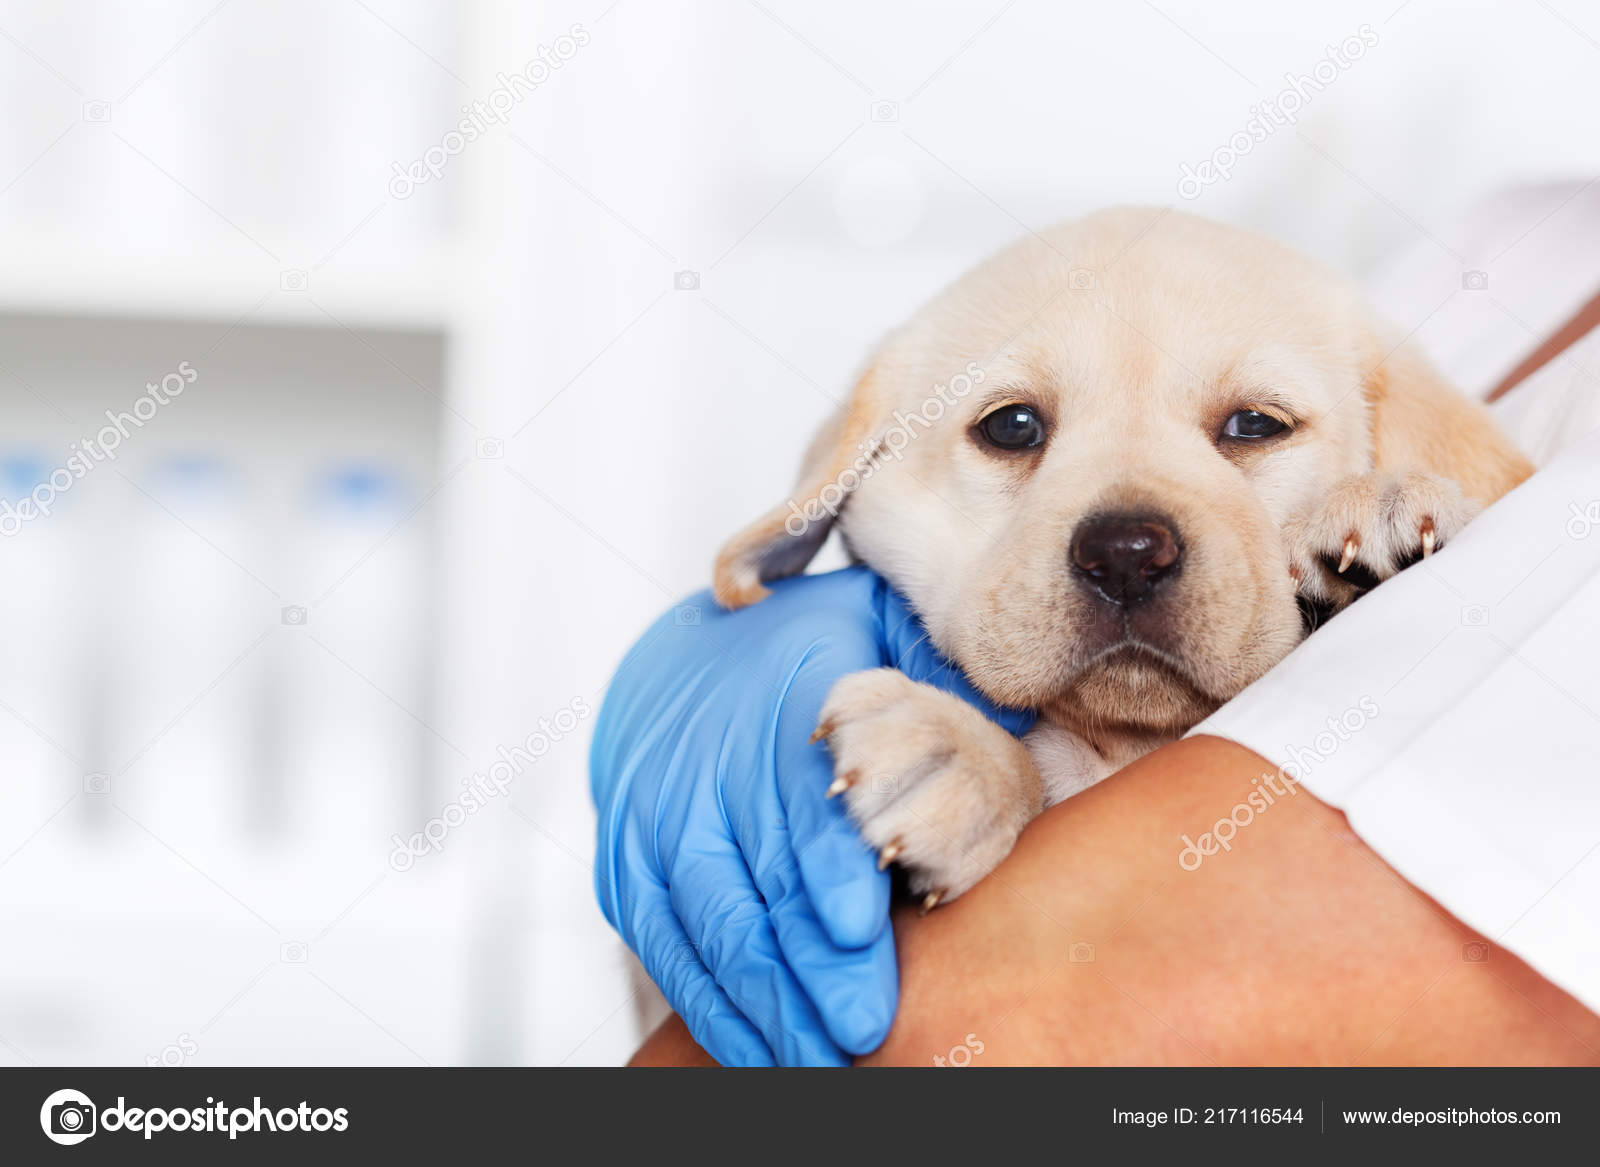 Veterinary Healthcare Professional Holding Cute Labrador Puppy Dog